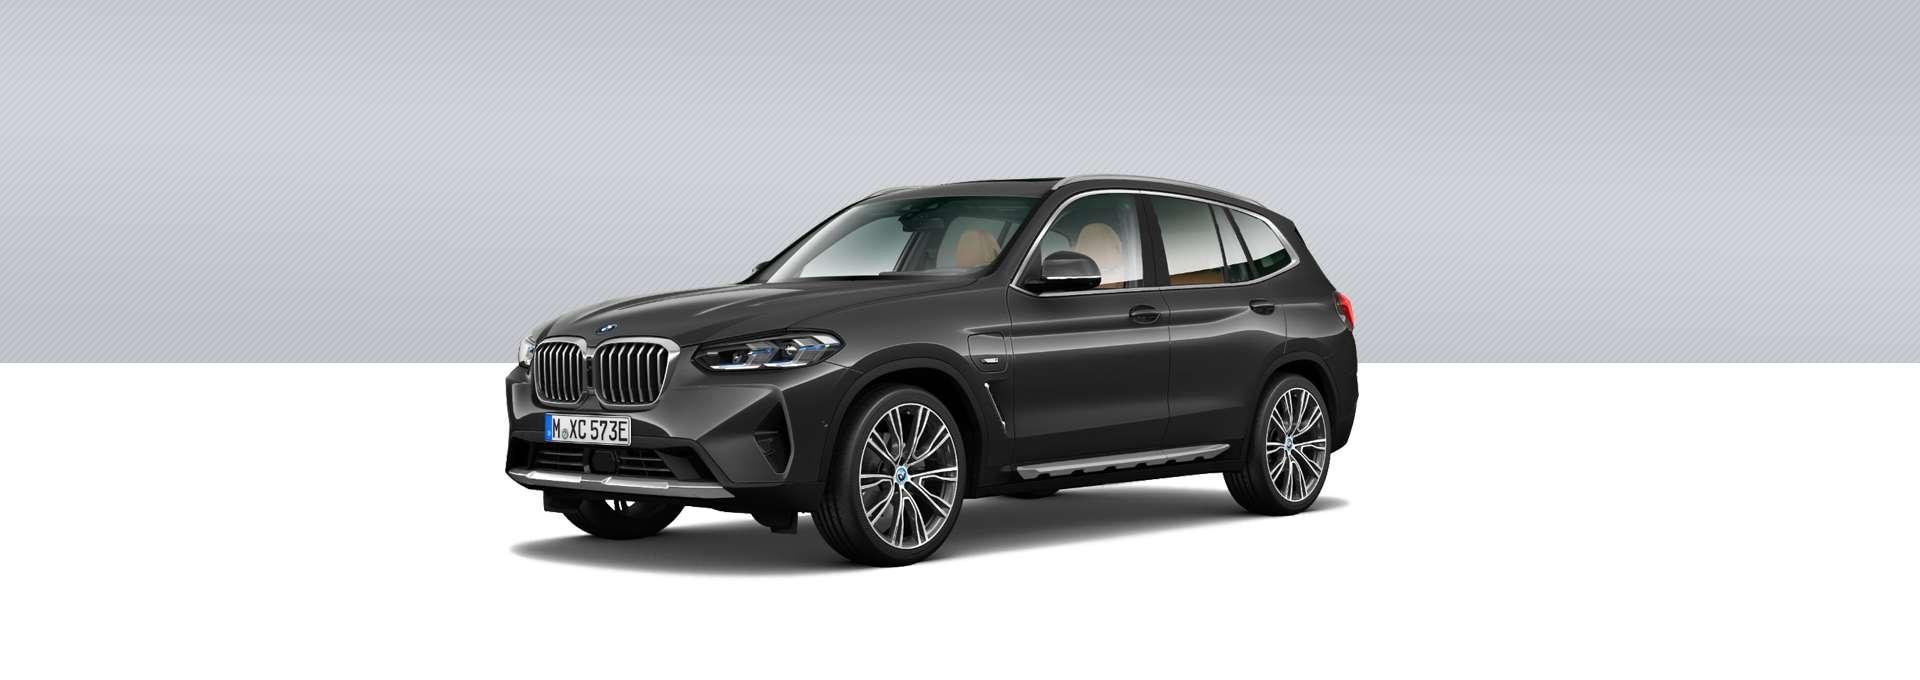 BMW Nuevo X3 Híbrido enchufable